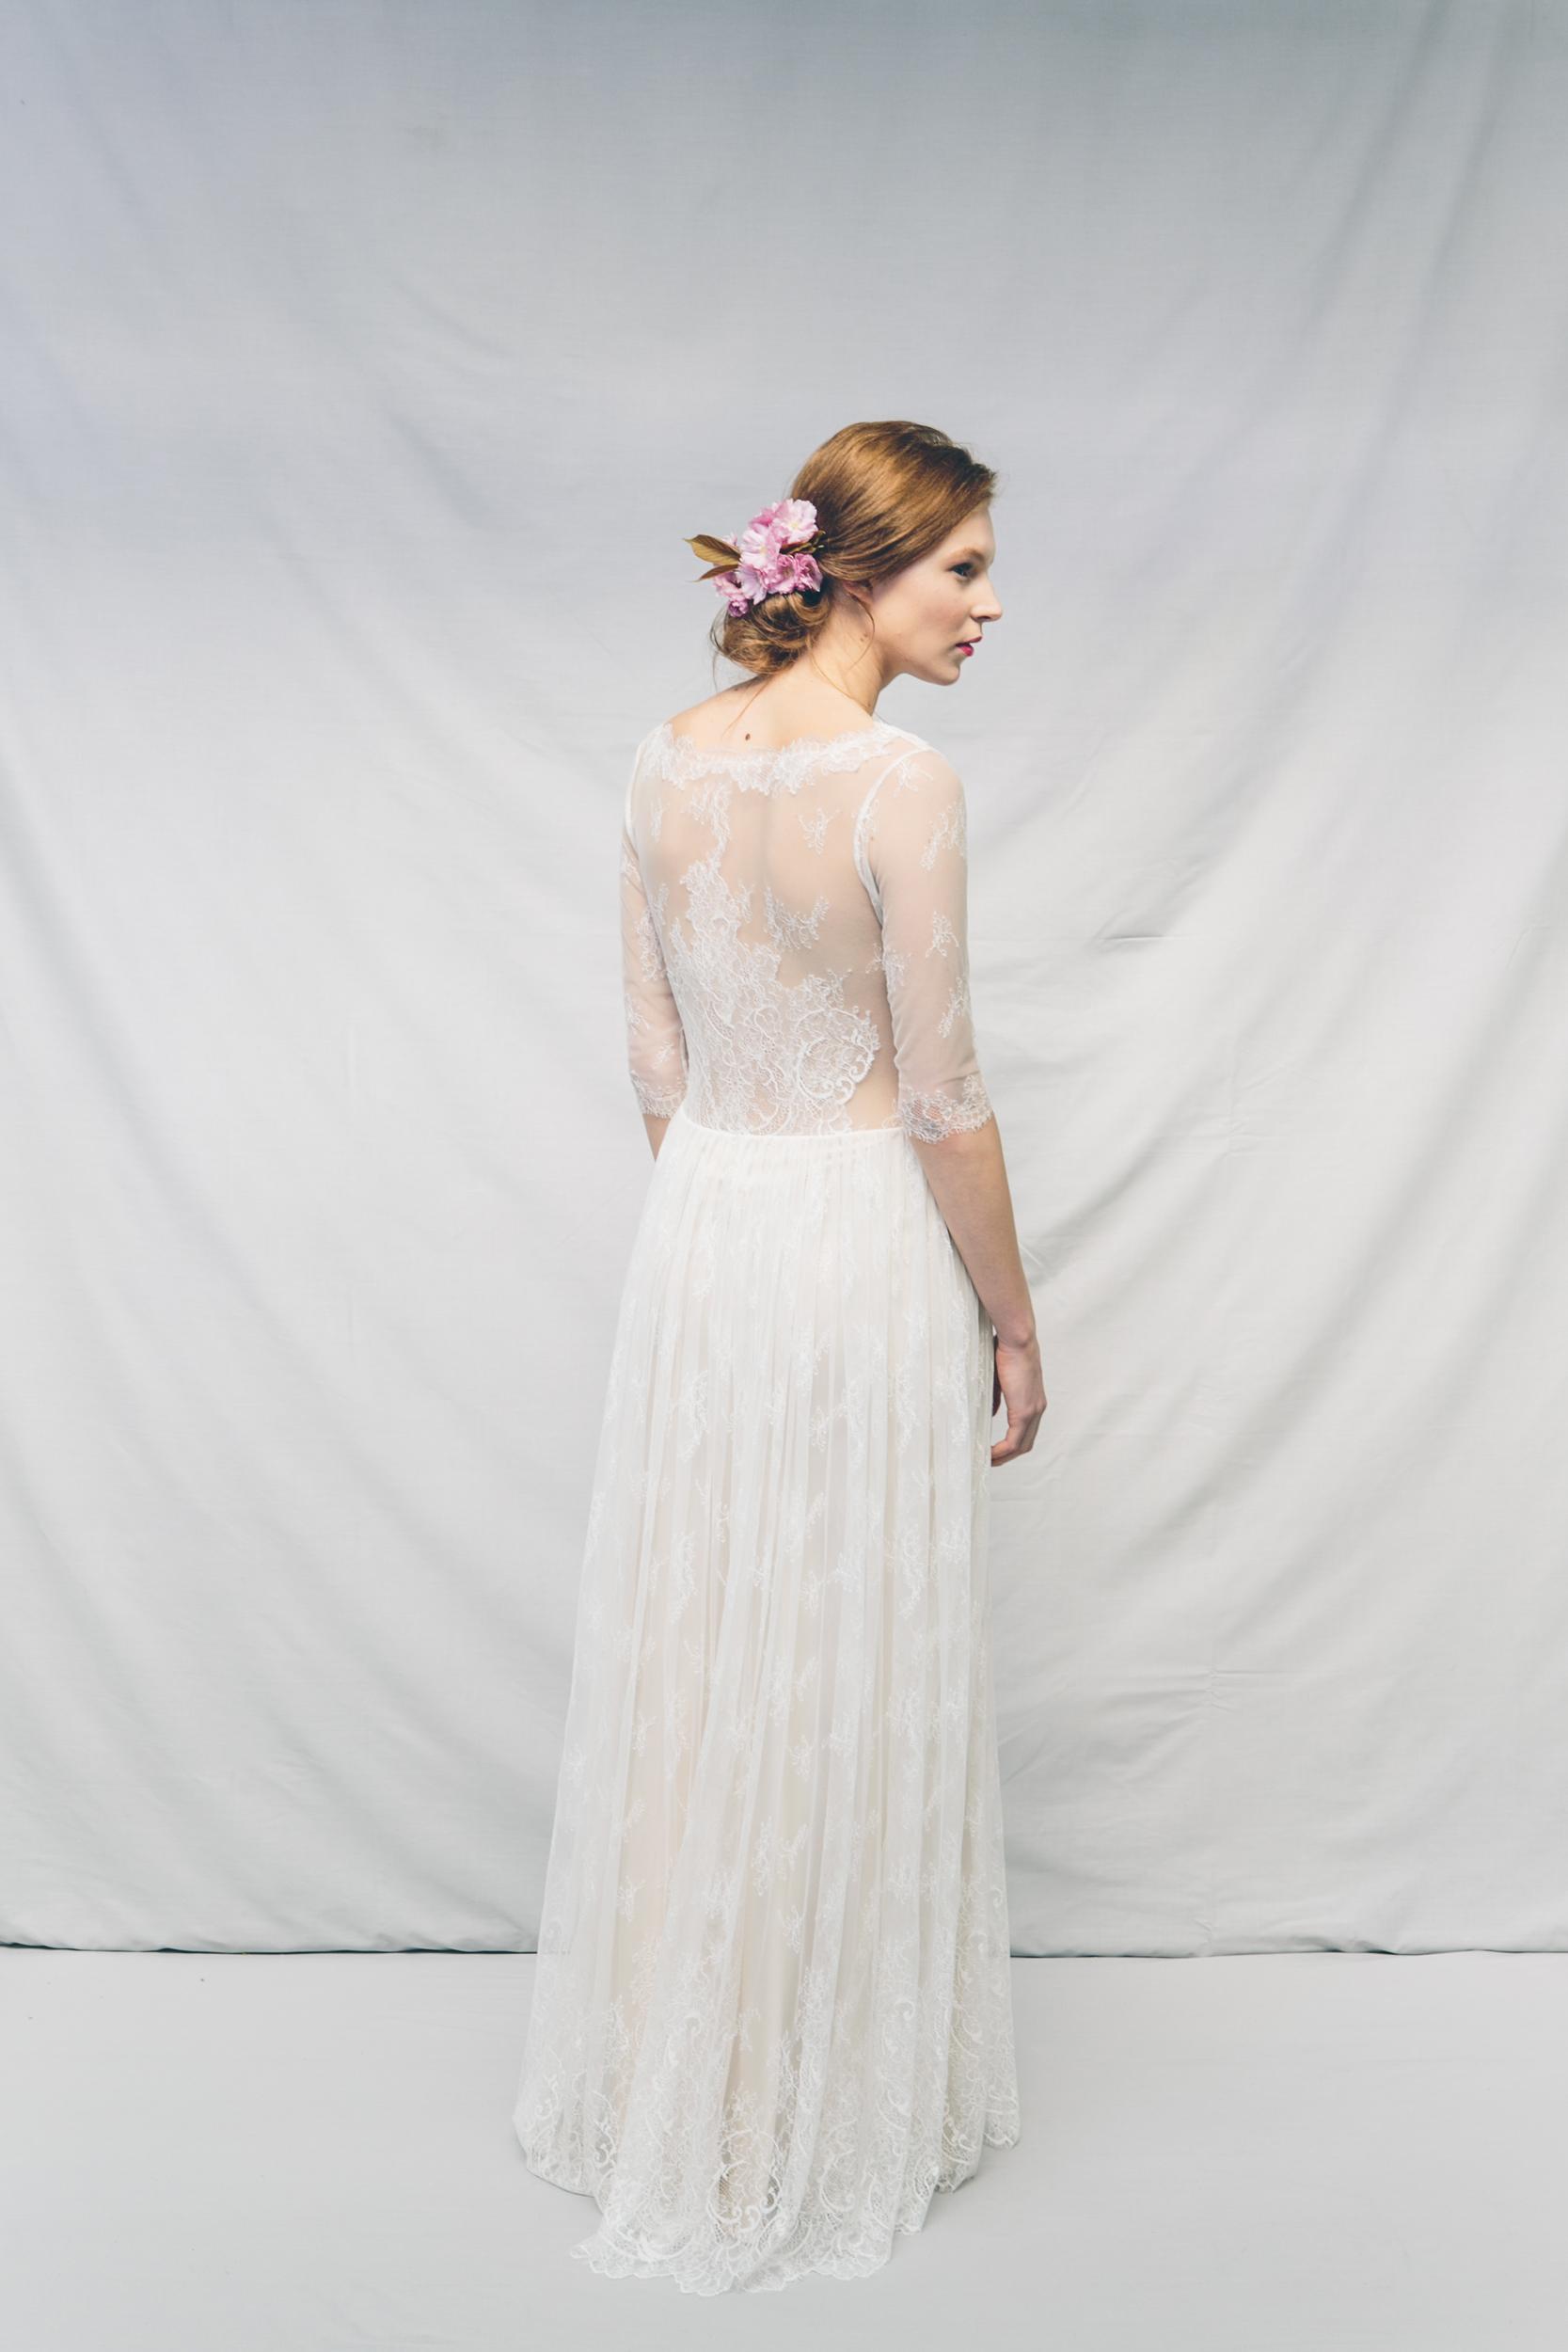 Kate-Beaumont-Wedding-Dresses-Sheffield-22.jpg